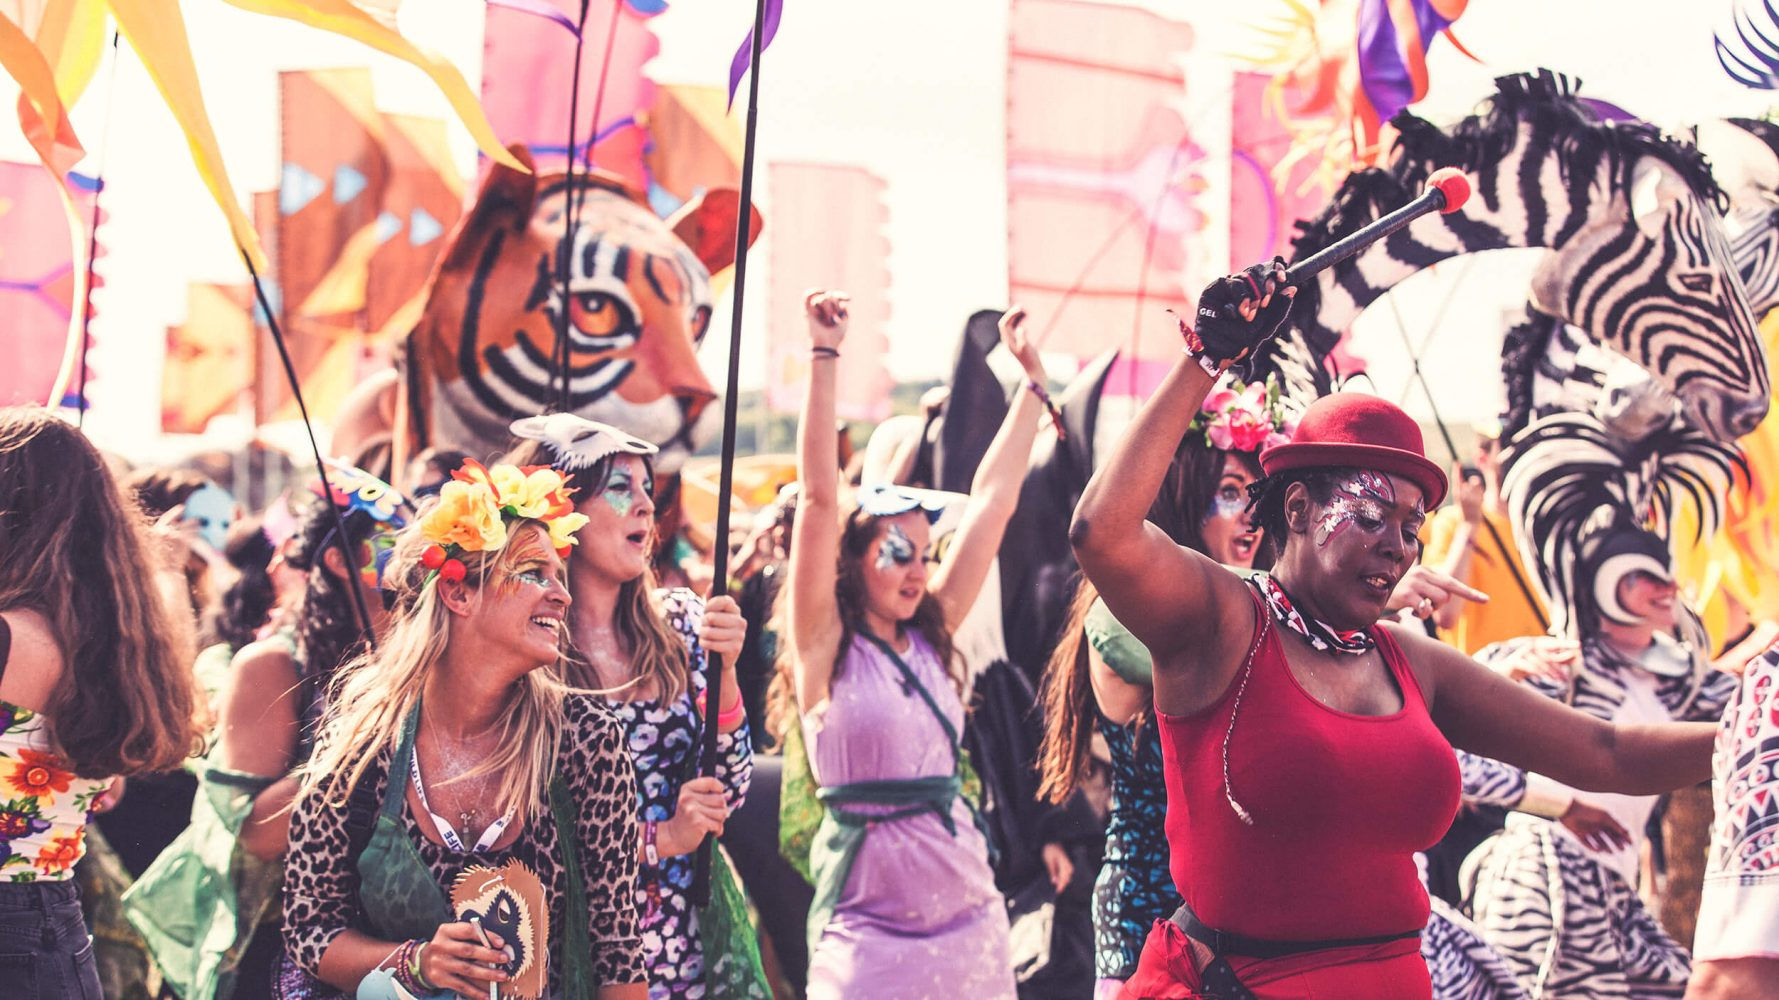 Crowd celebration at Wildlife festival